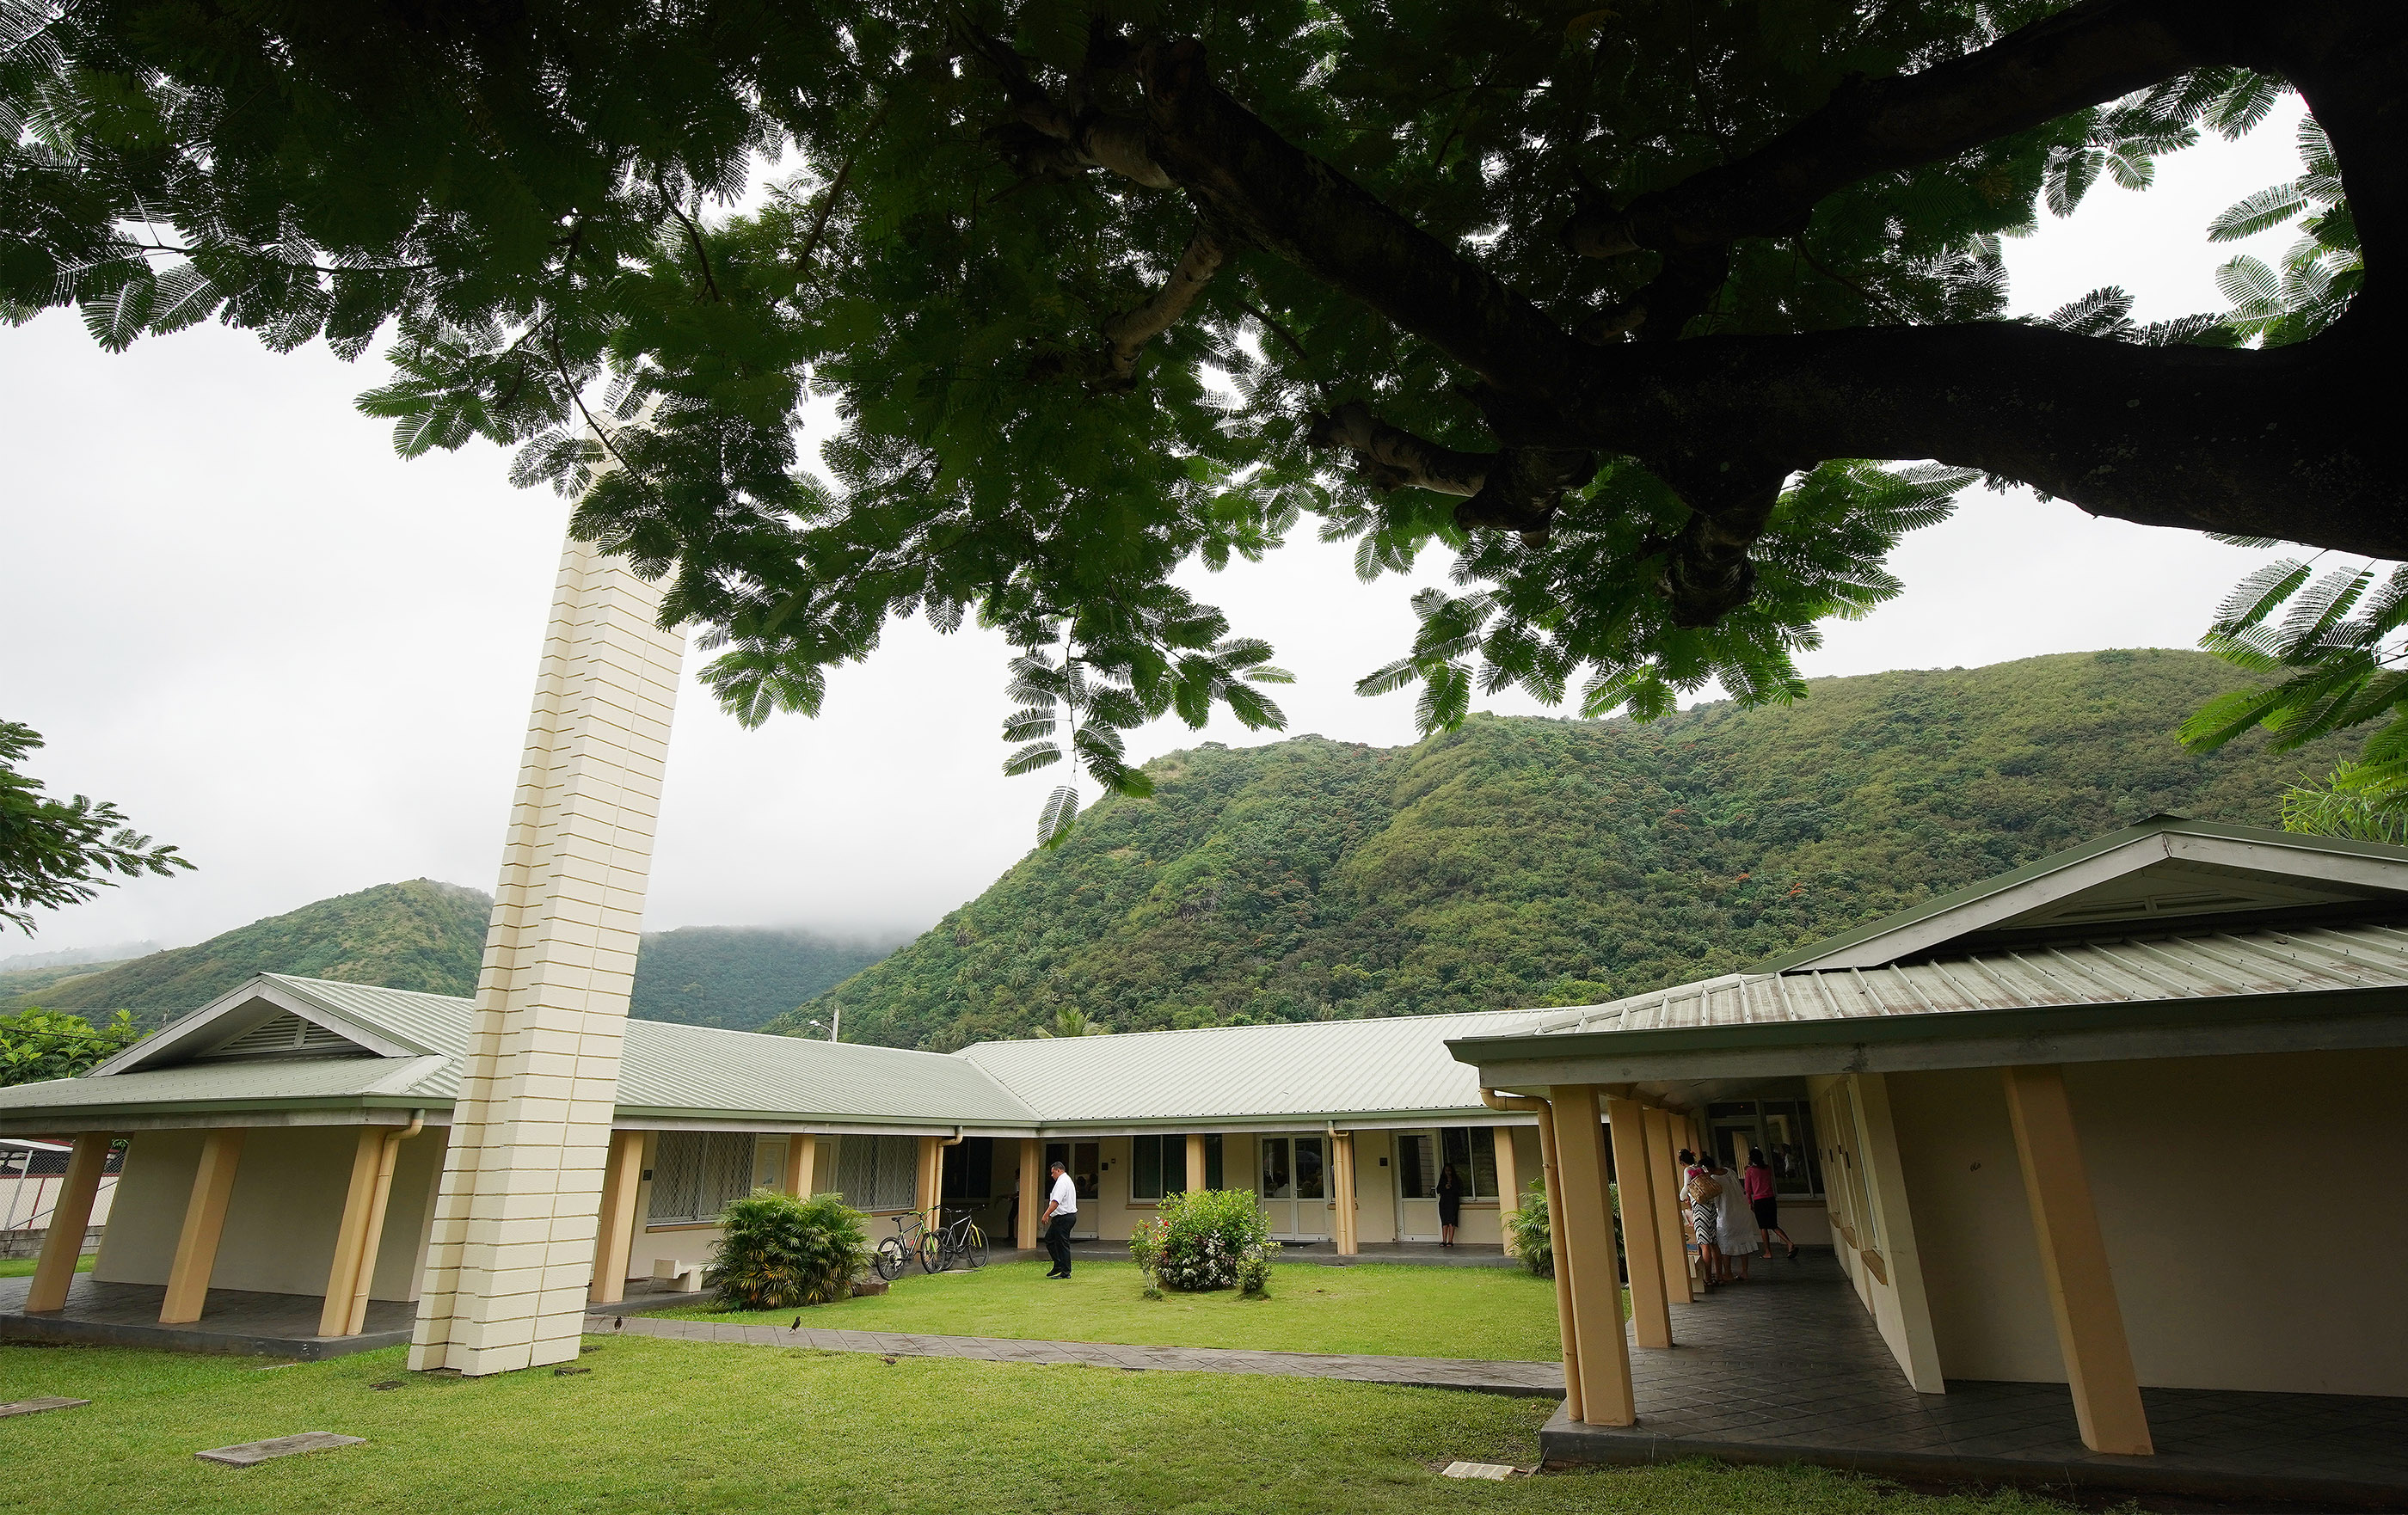 Members walk between meetings at The Church of Jesus Christ of Latter-day Saints in Papeete, Tahiti, on May 26, 2019.